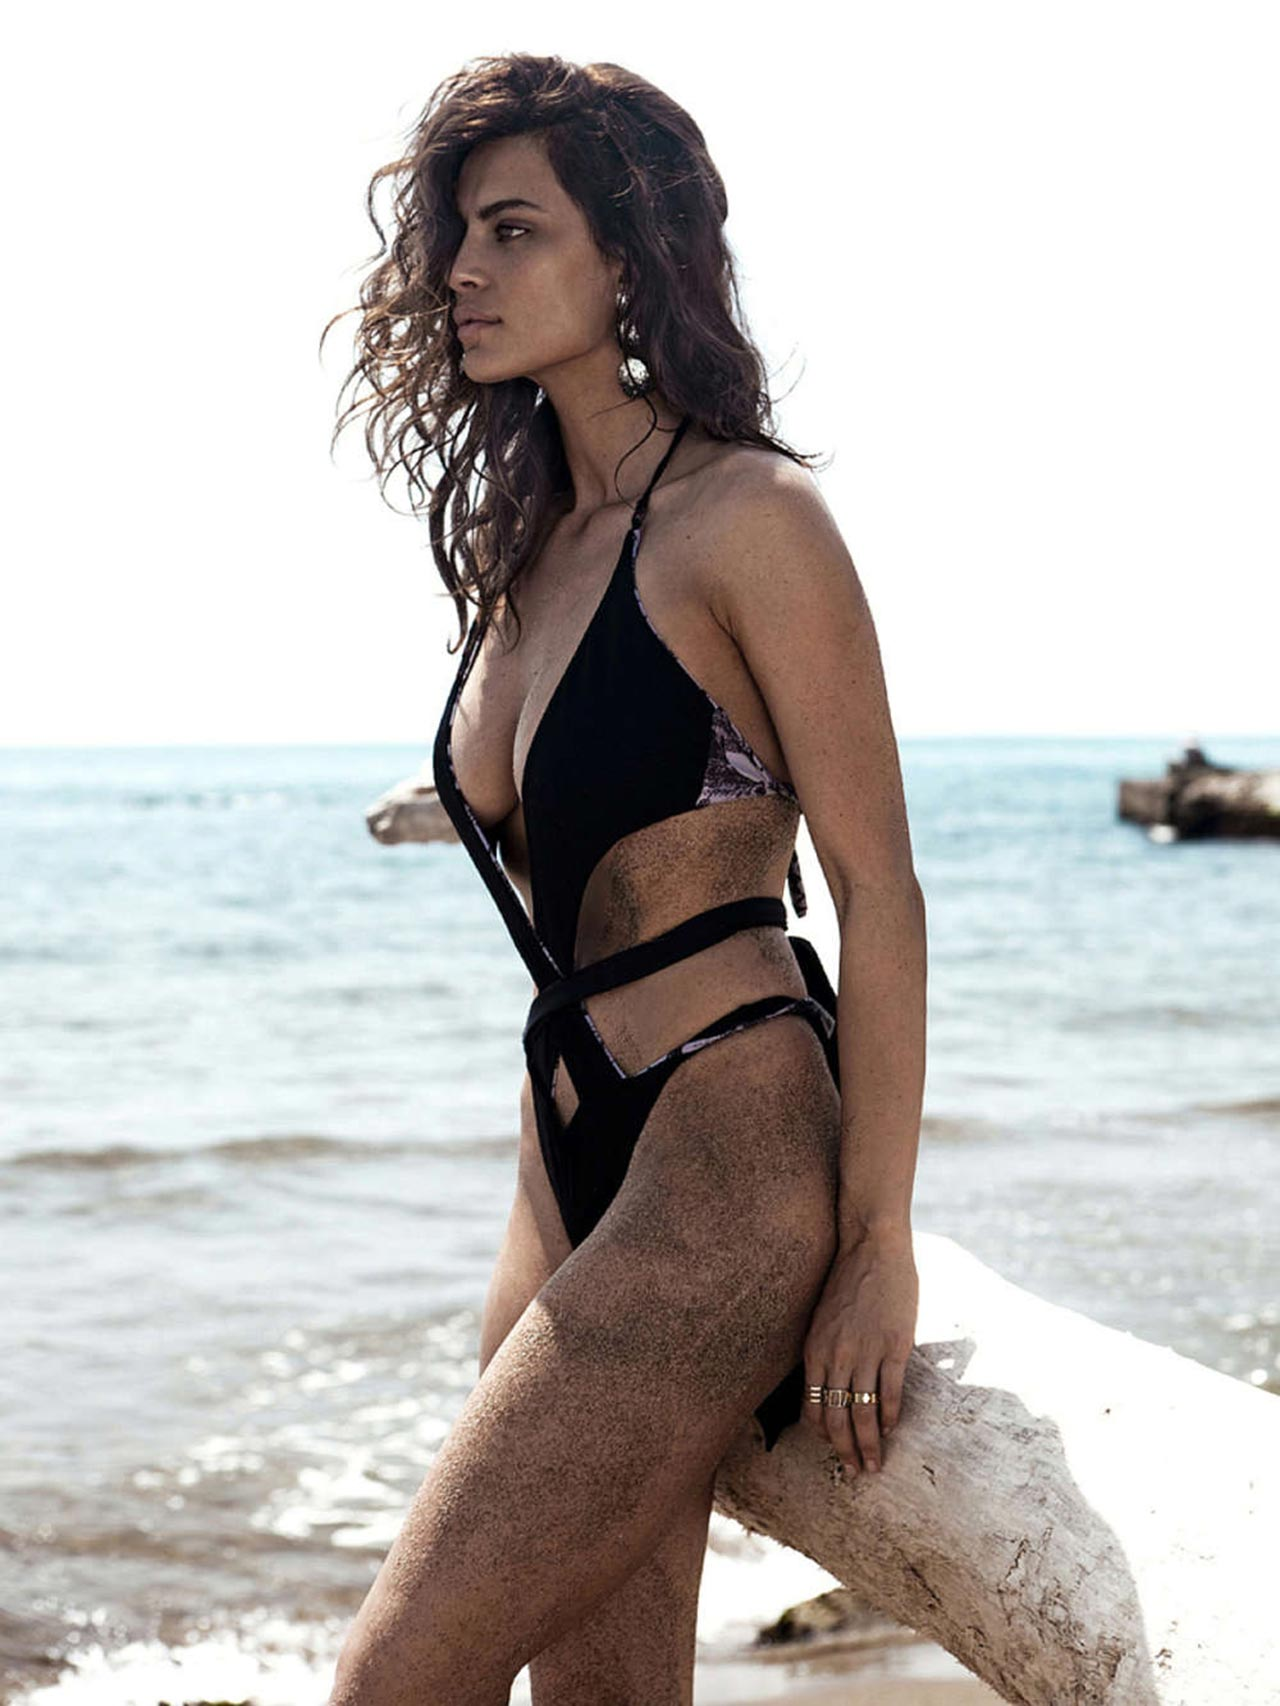 Bikini Catrinel Menghia nude (89 foto and video), Ass, Cleavage, Instagram, butt 2015